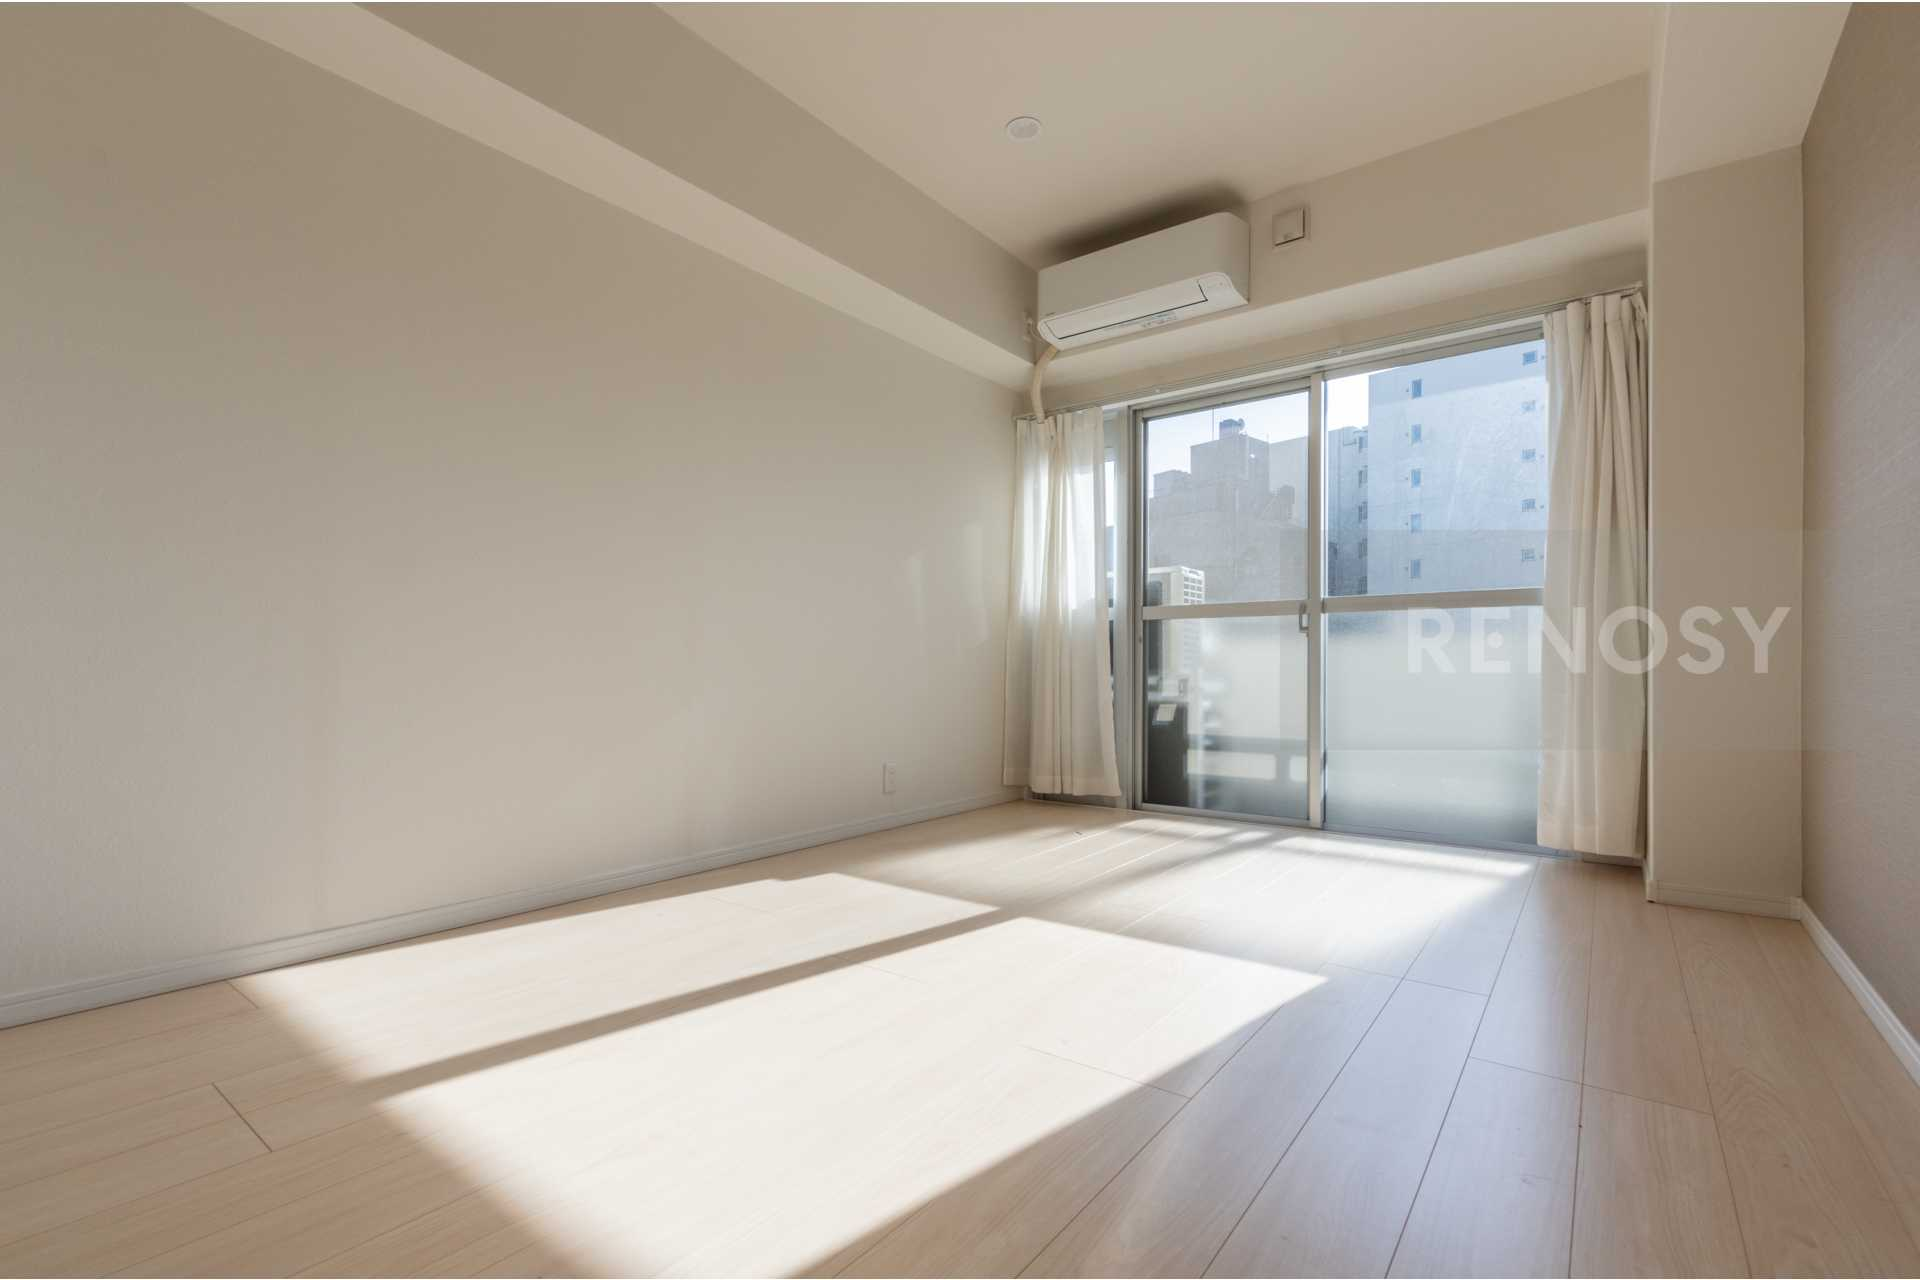 17_【ldd3_sell】五反田リーラハイタウン903号室_20201202195828.jpg